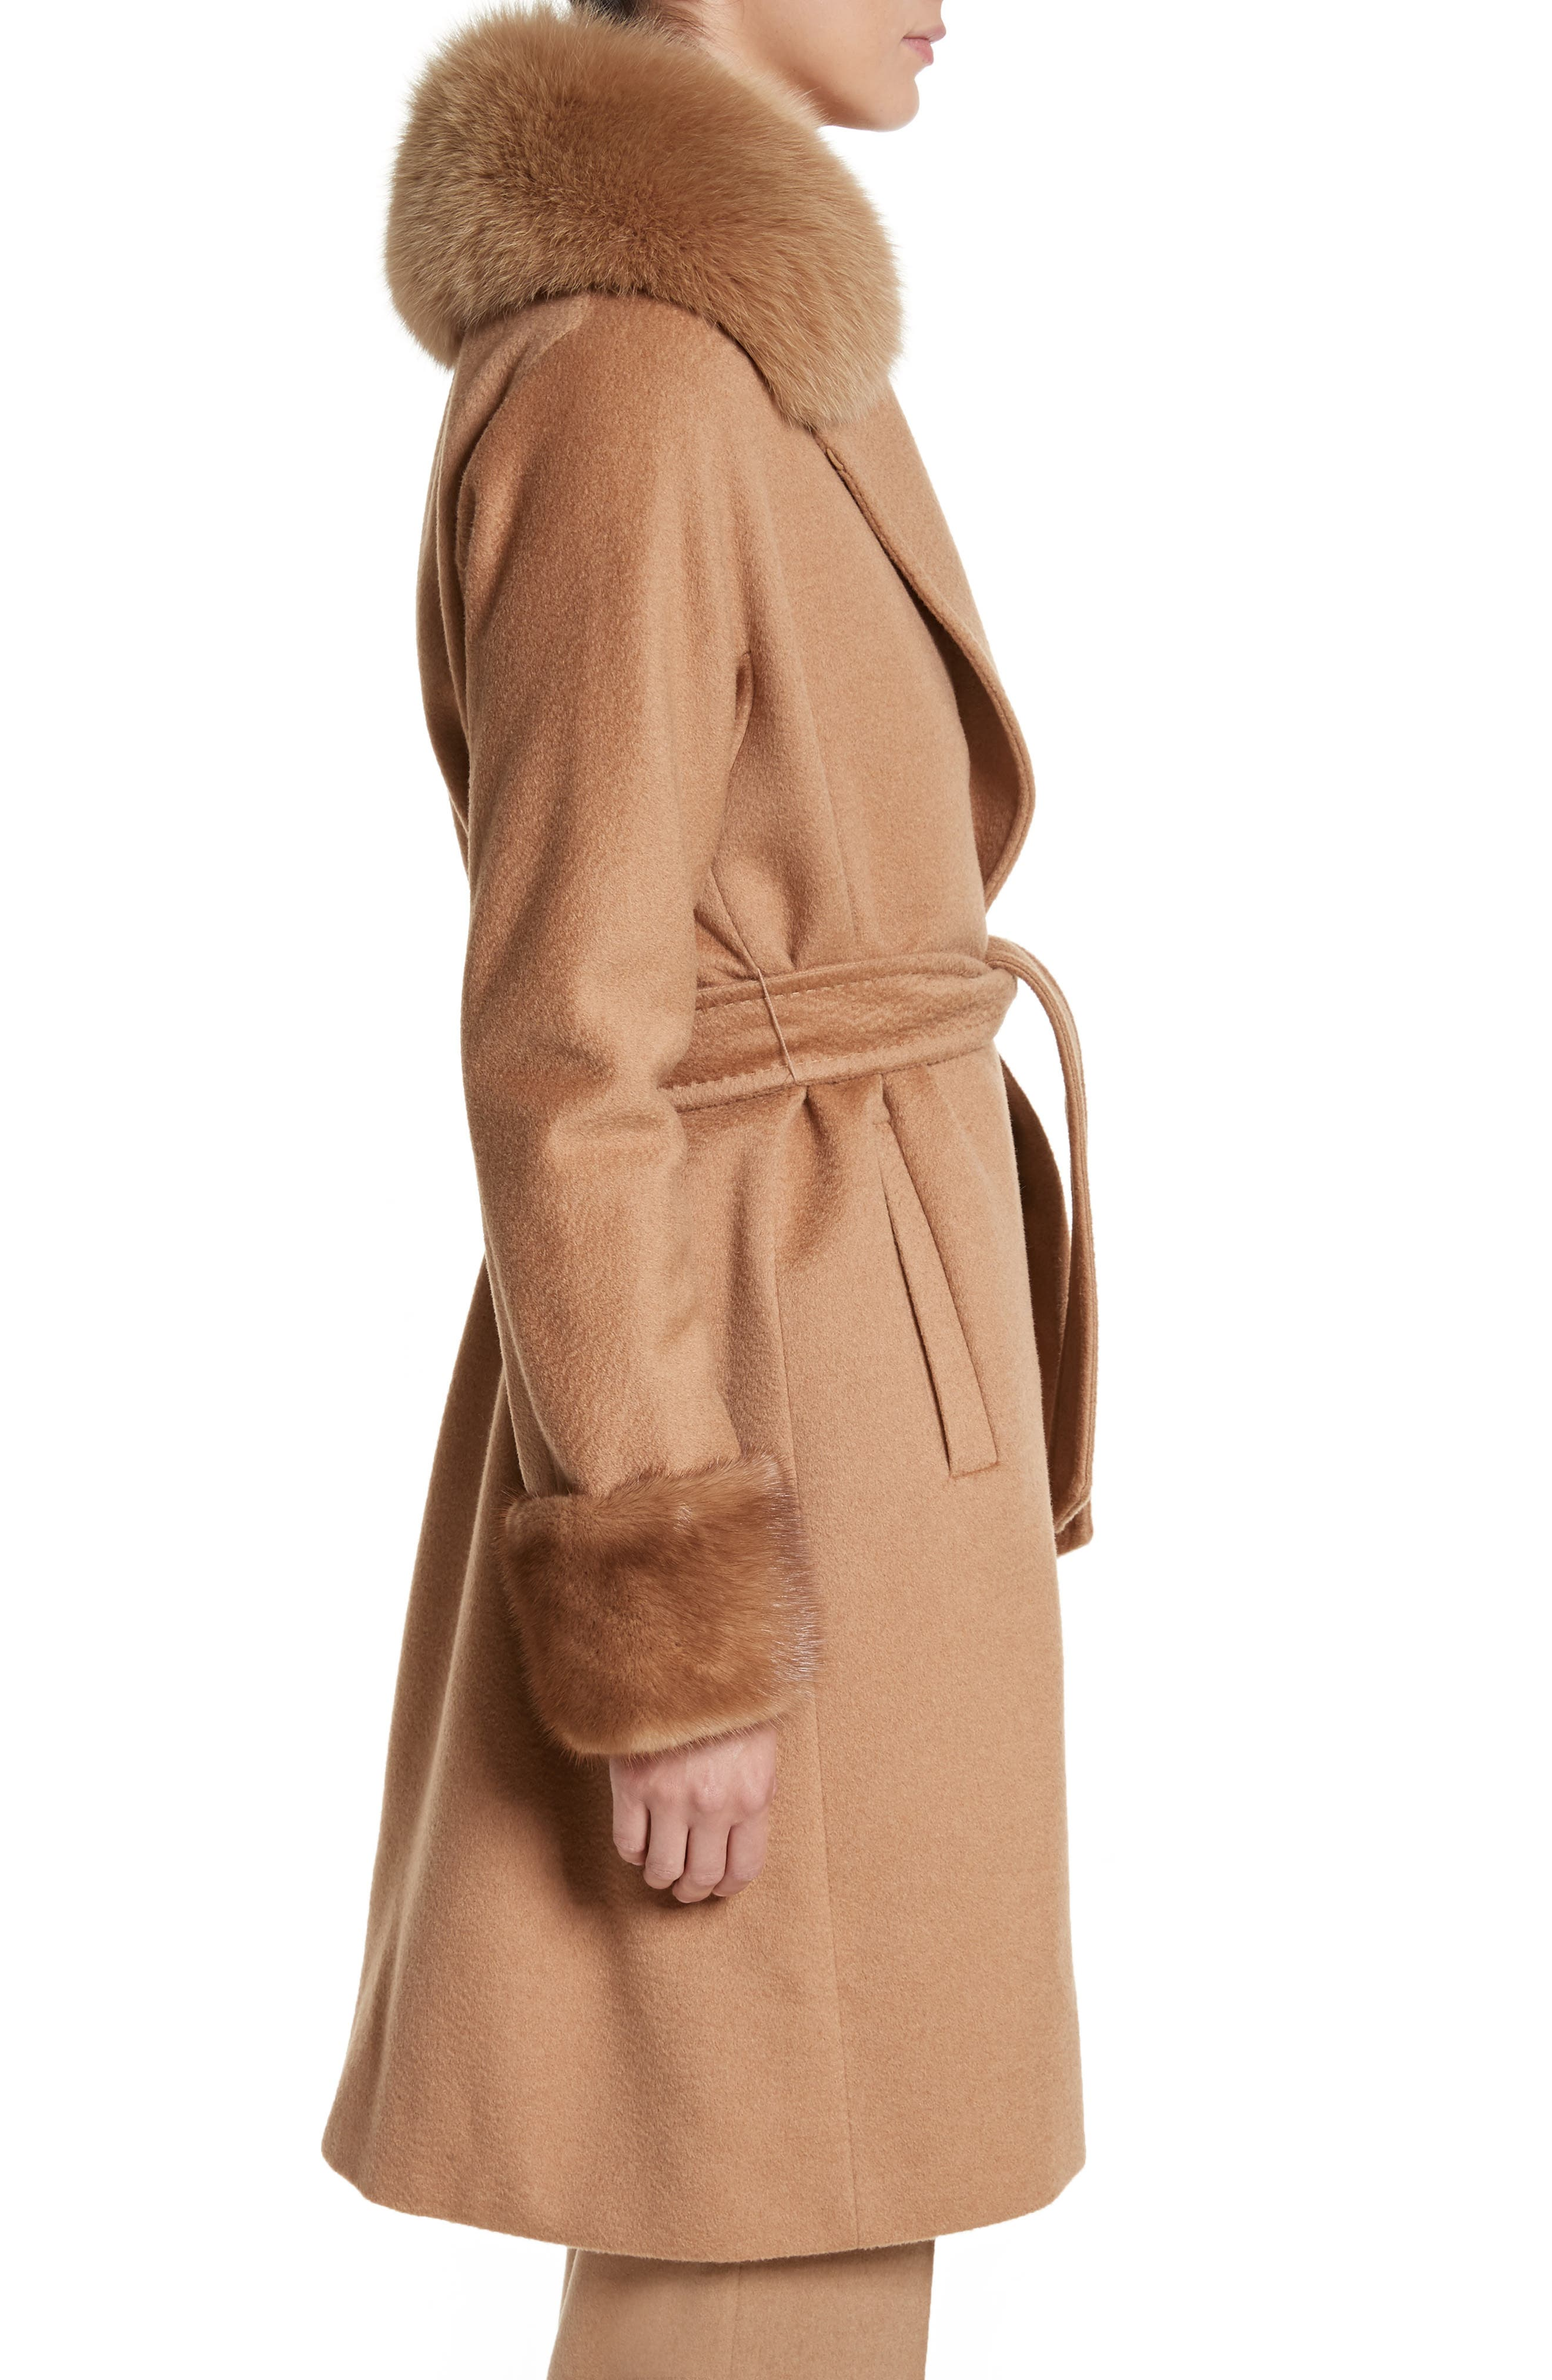 Camel Hair Coat with Genuine Fox Fur & Genuine Mink Fur Trim,                             Alternate thumbnail 3, color,                             232